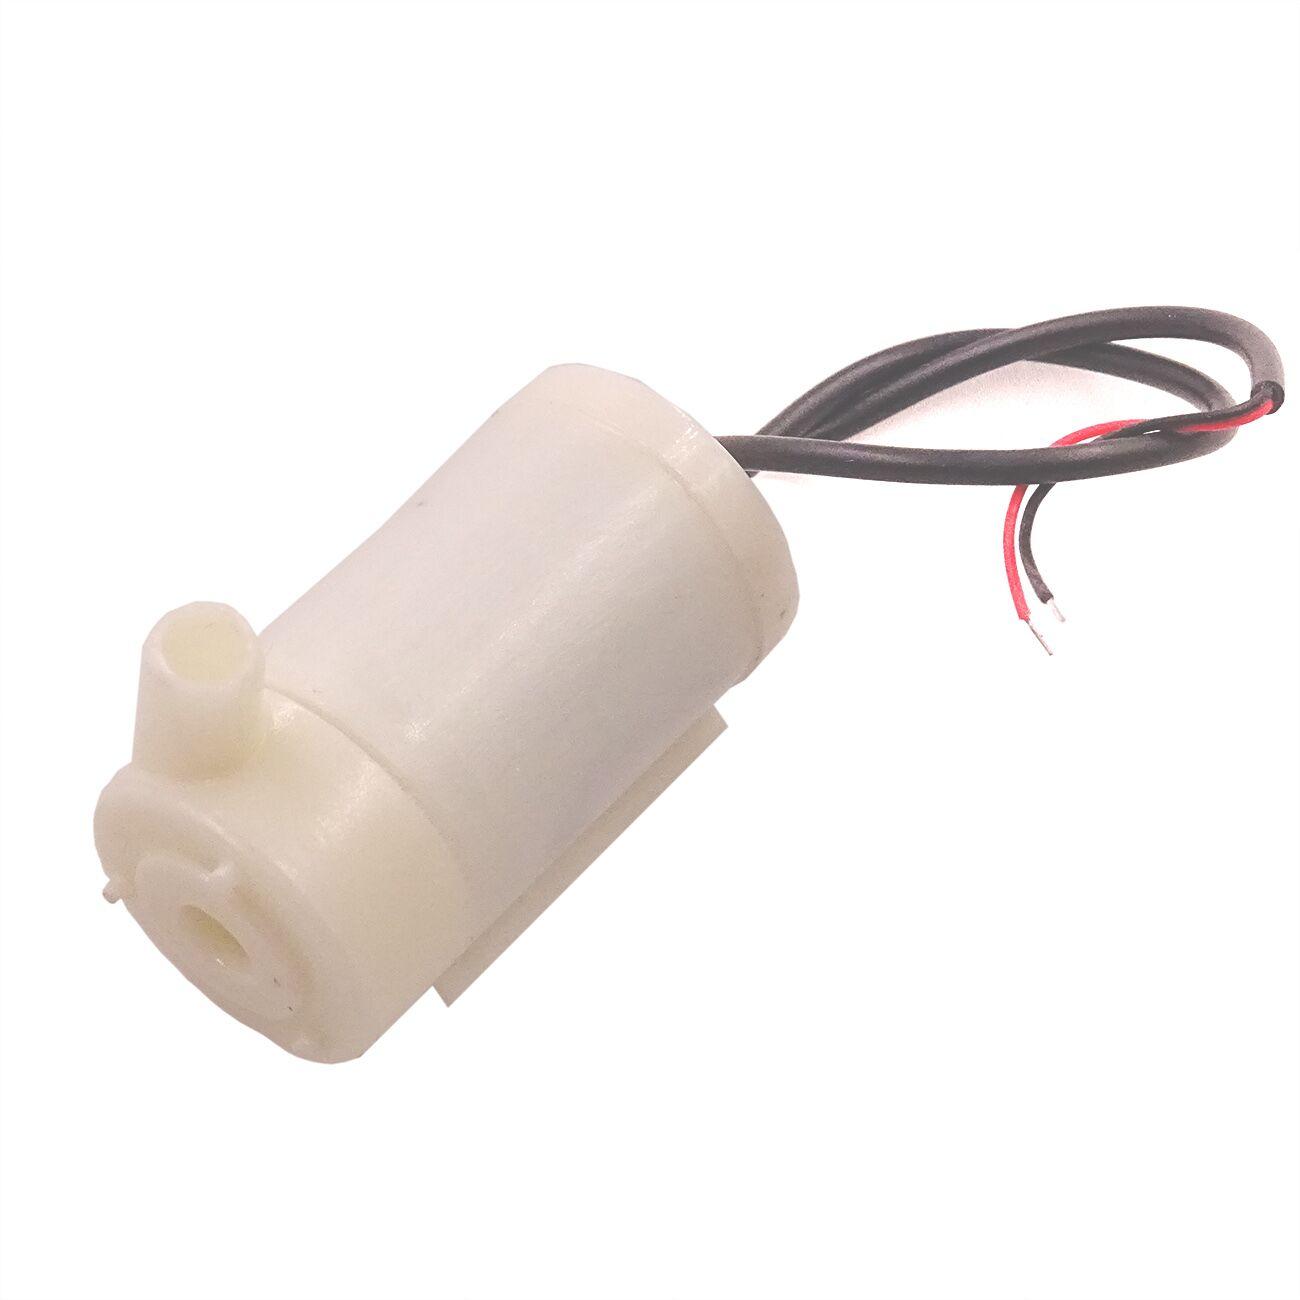 5PCS Mini Micro Submersible Motor Pump New Water Pumps DC 3-6V 120L//H Low NEW CA